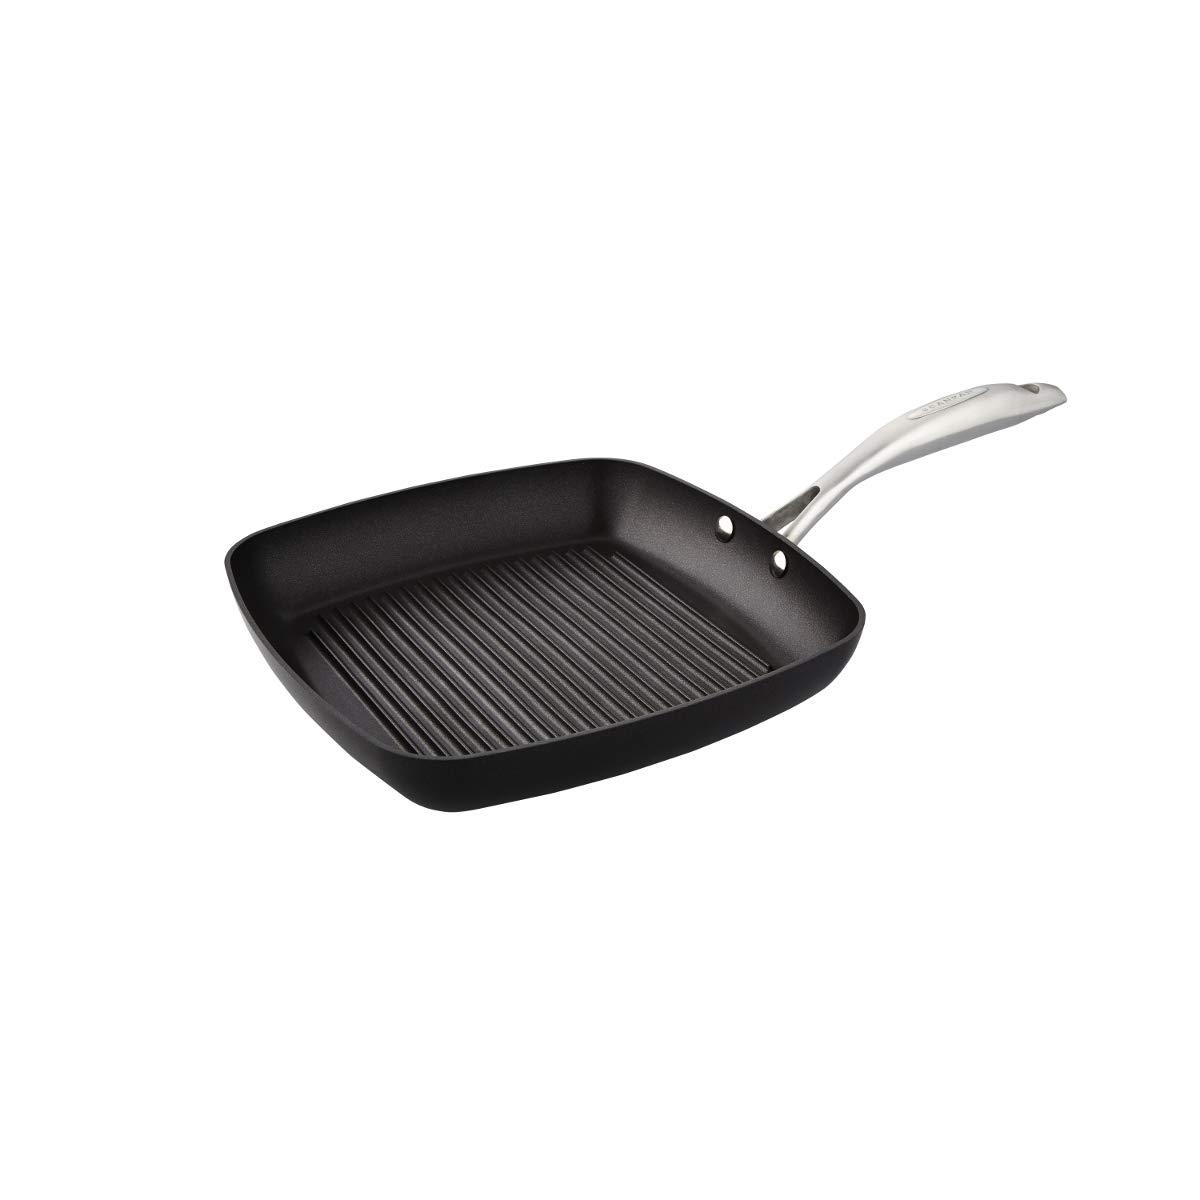 Scanpan Pro IQ 10.5 Inch Grill Pan